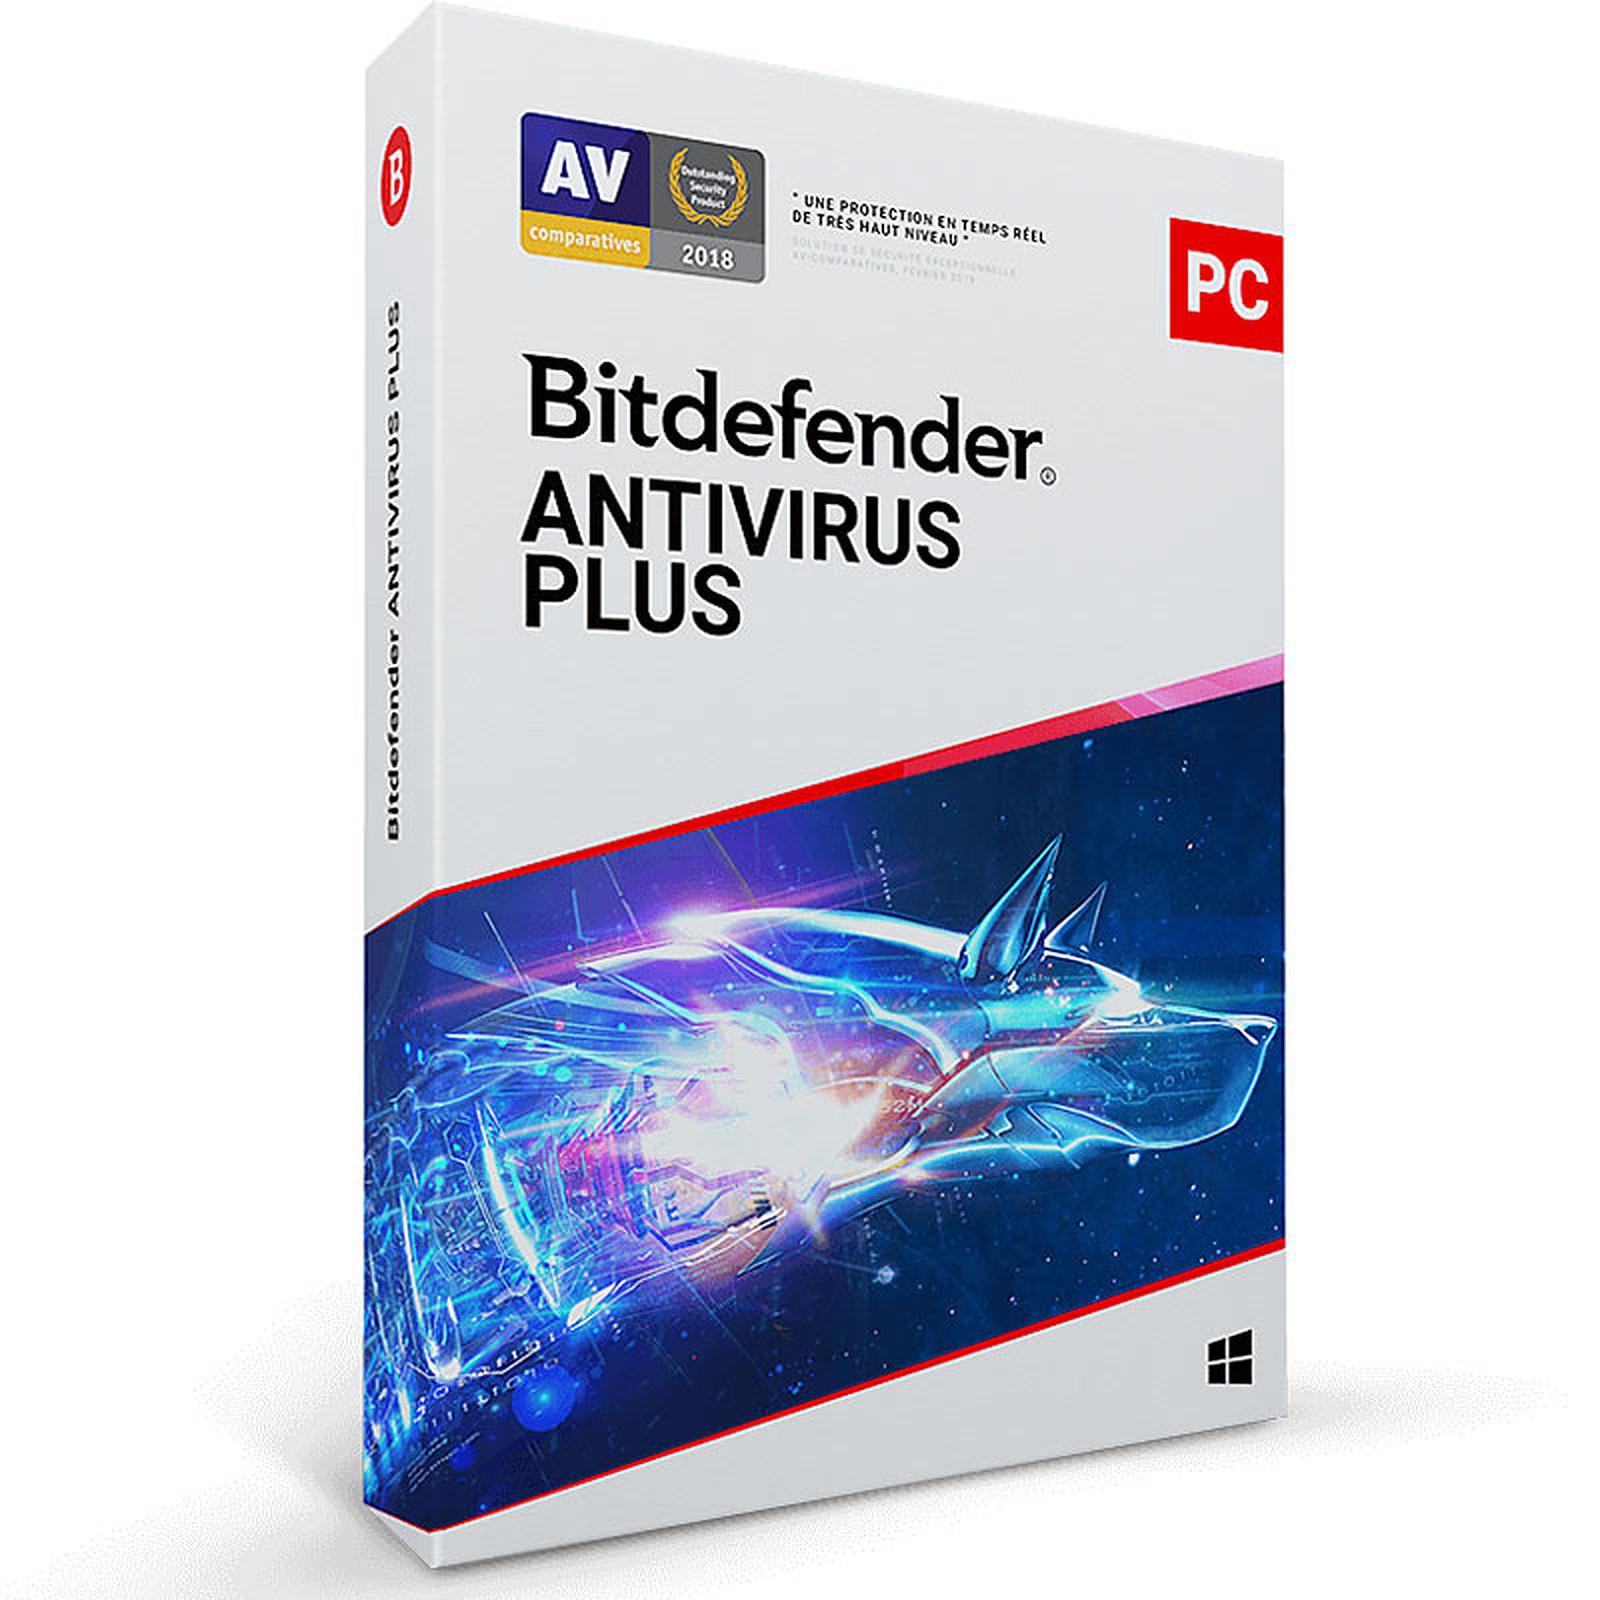 Bitdefender Antivirus Plus 2020 - Licence 3 postes 2 ans